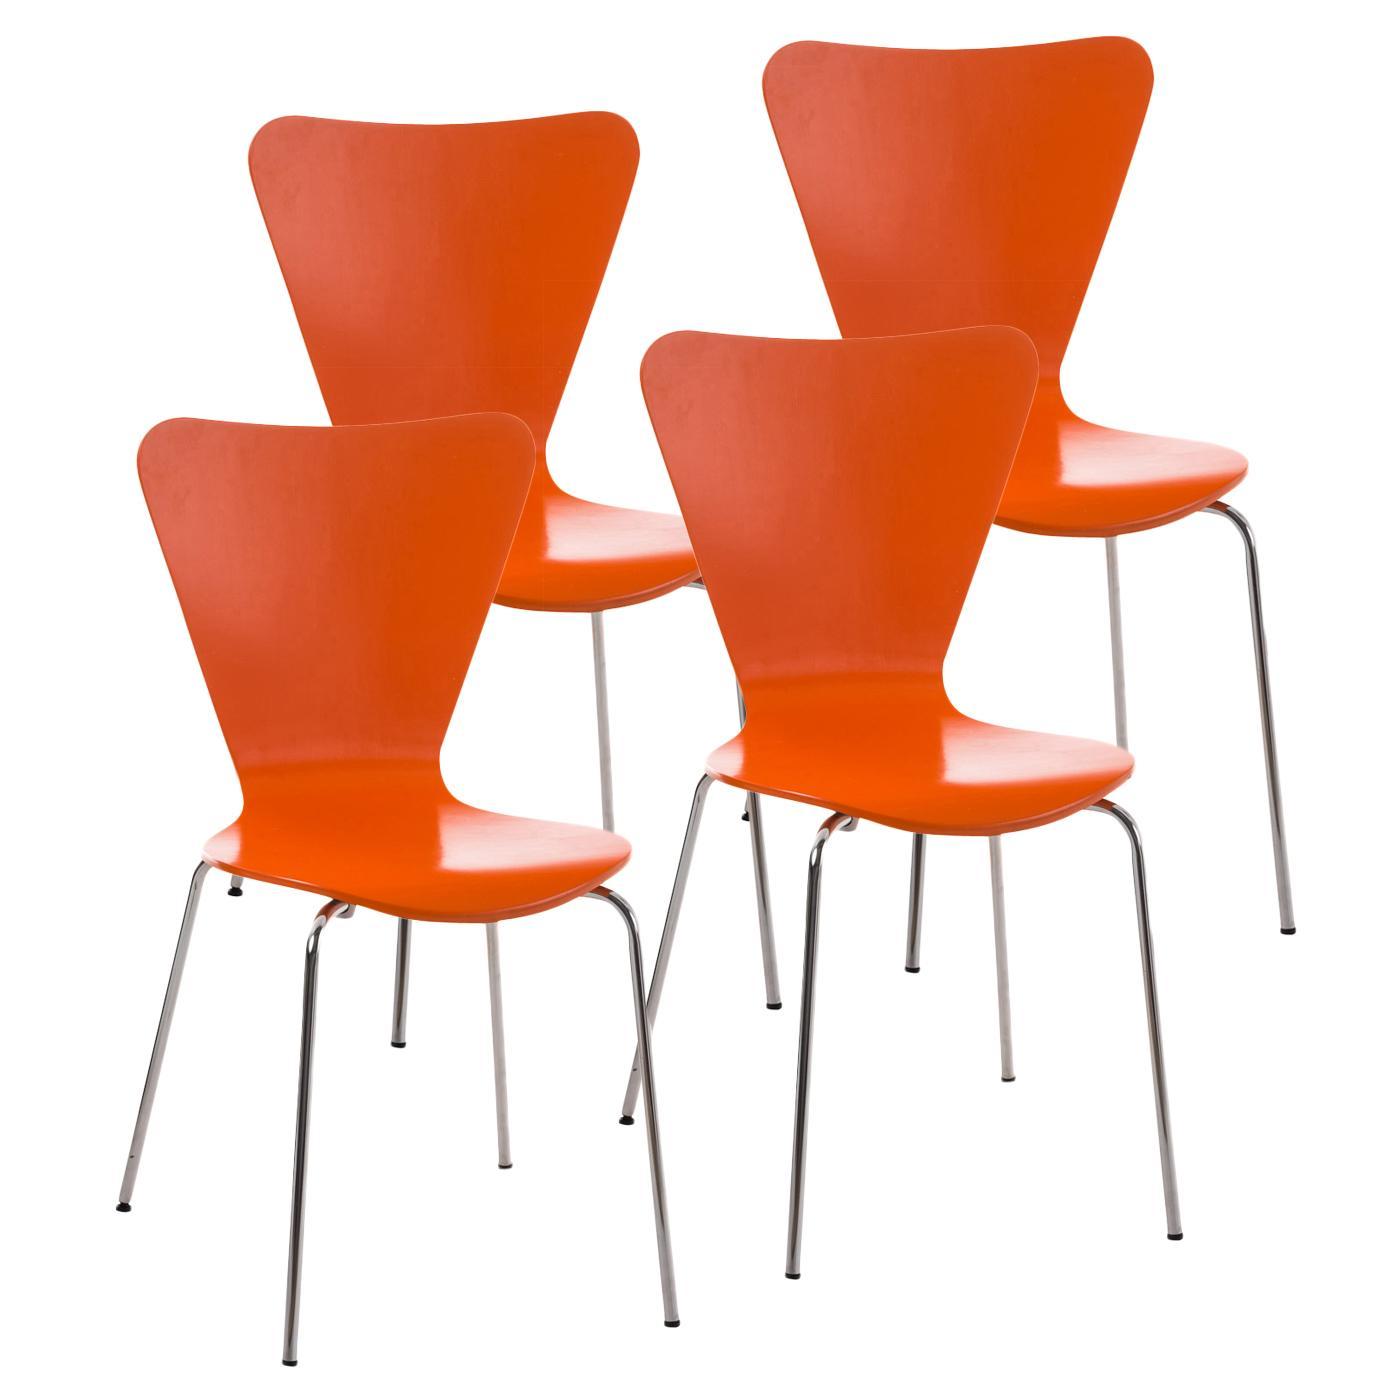 Lotto 4 sedie lerma in arancione for Sedie da cucina in metallo